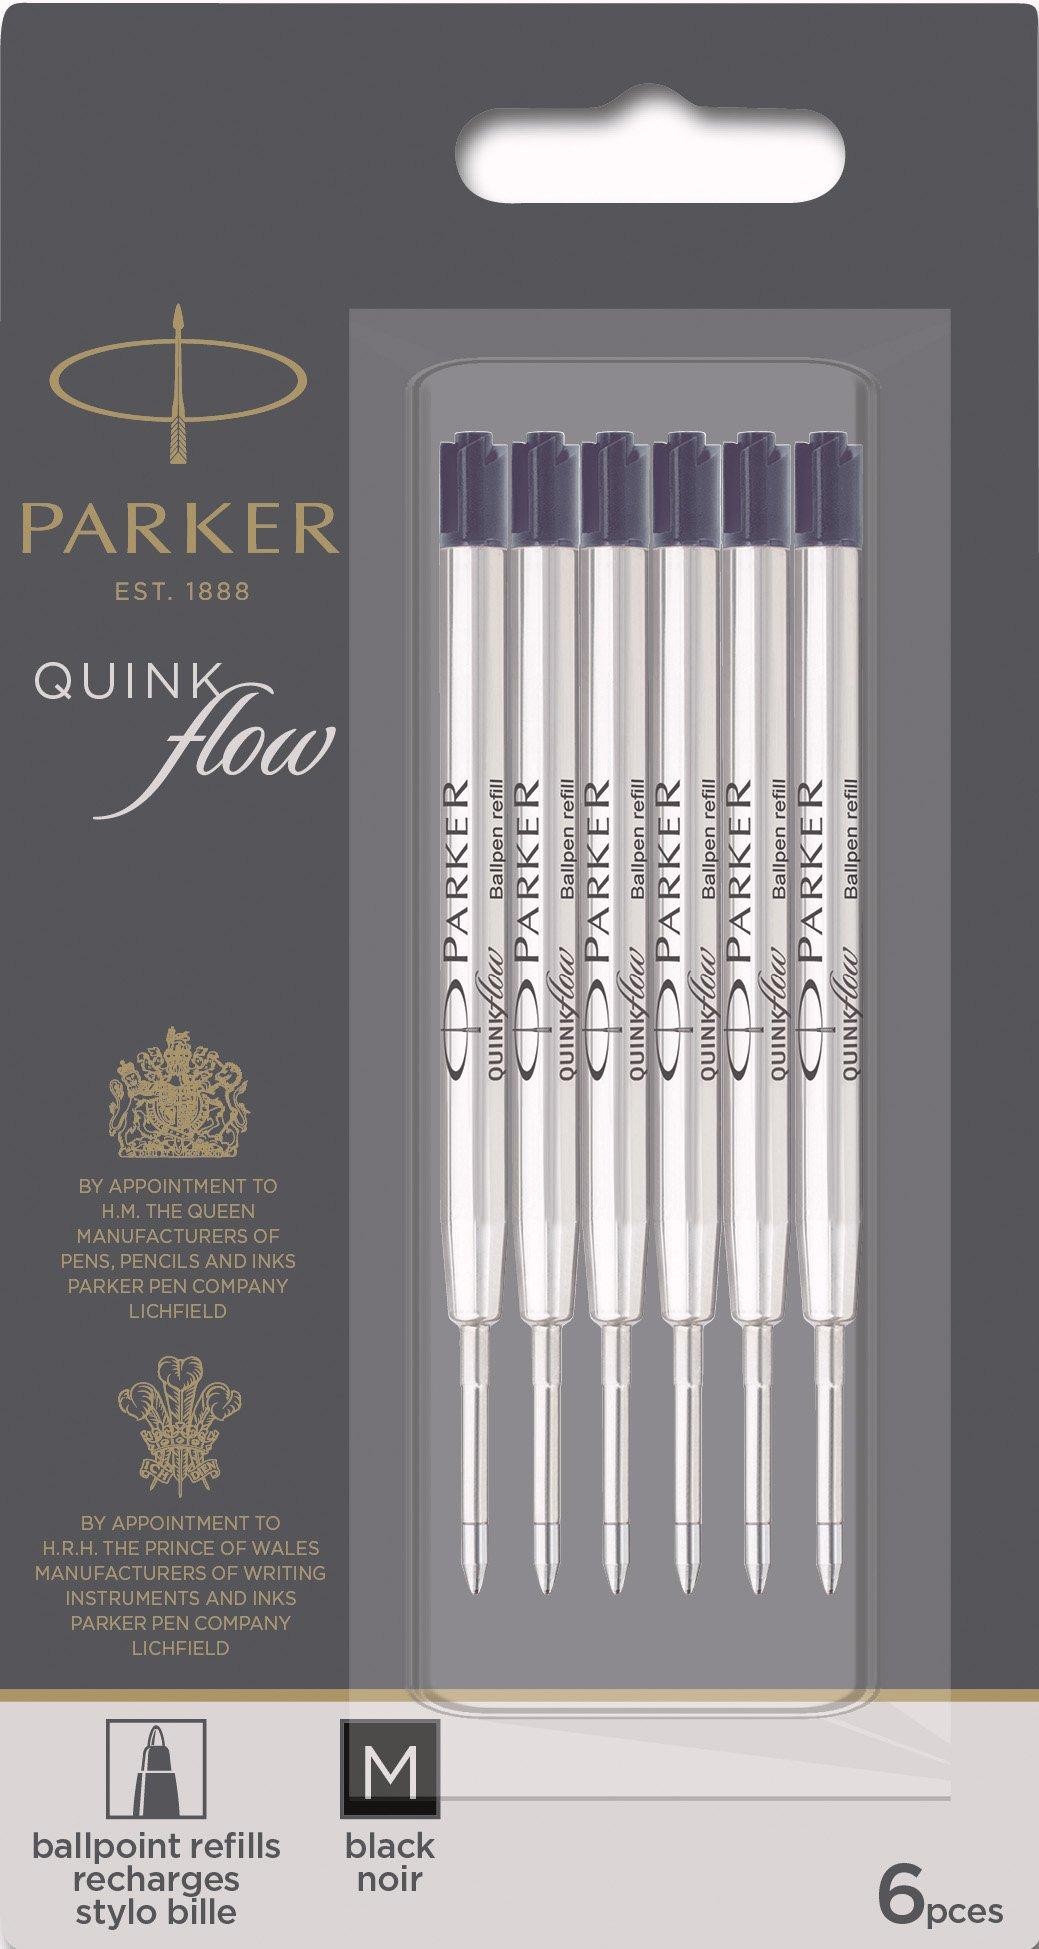 Parker QUINKflow Ballpoint Pen Ink Refills, Medium Tip, Black, 6 Count Value Pack (2025154) by Parker